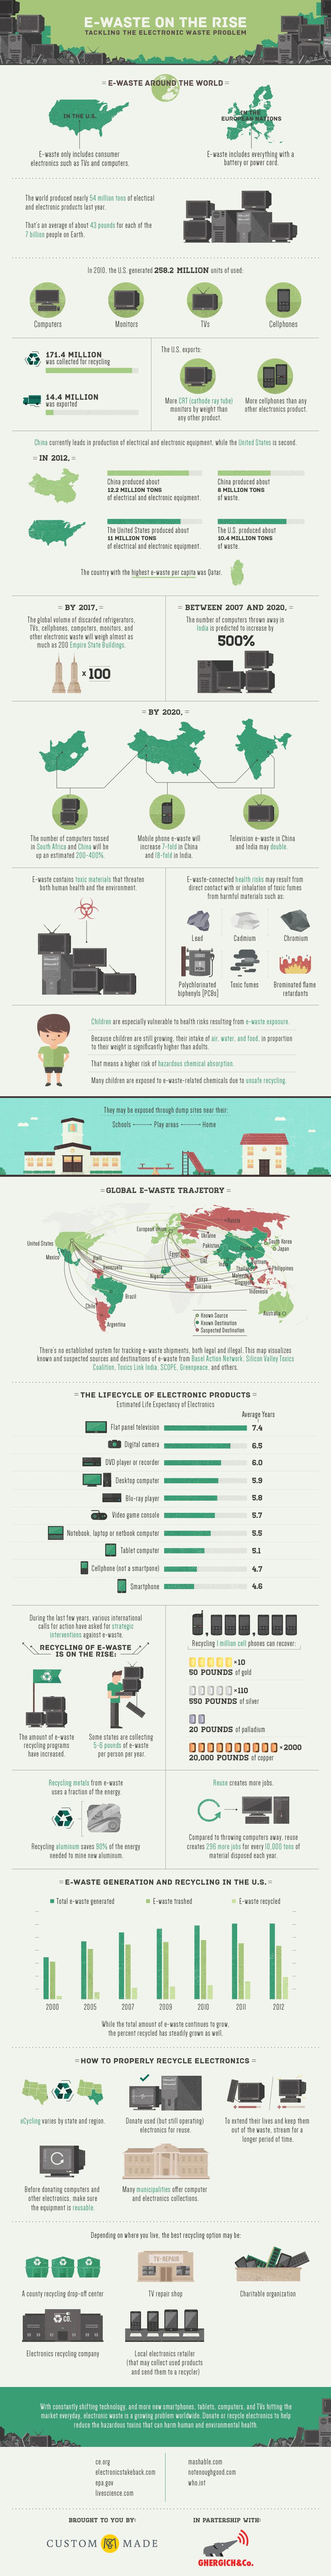 ewaste infographic